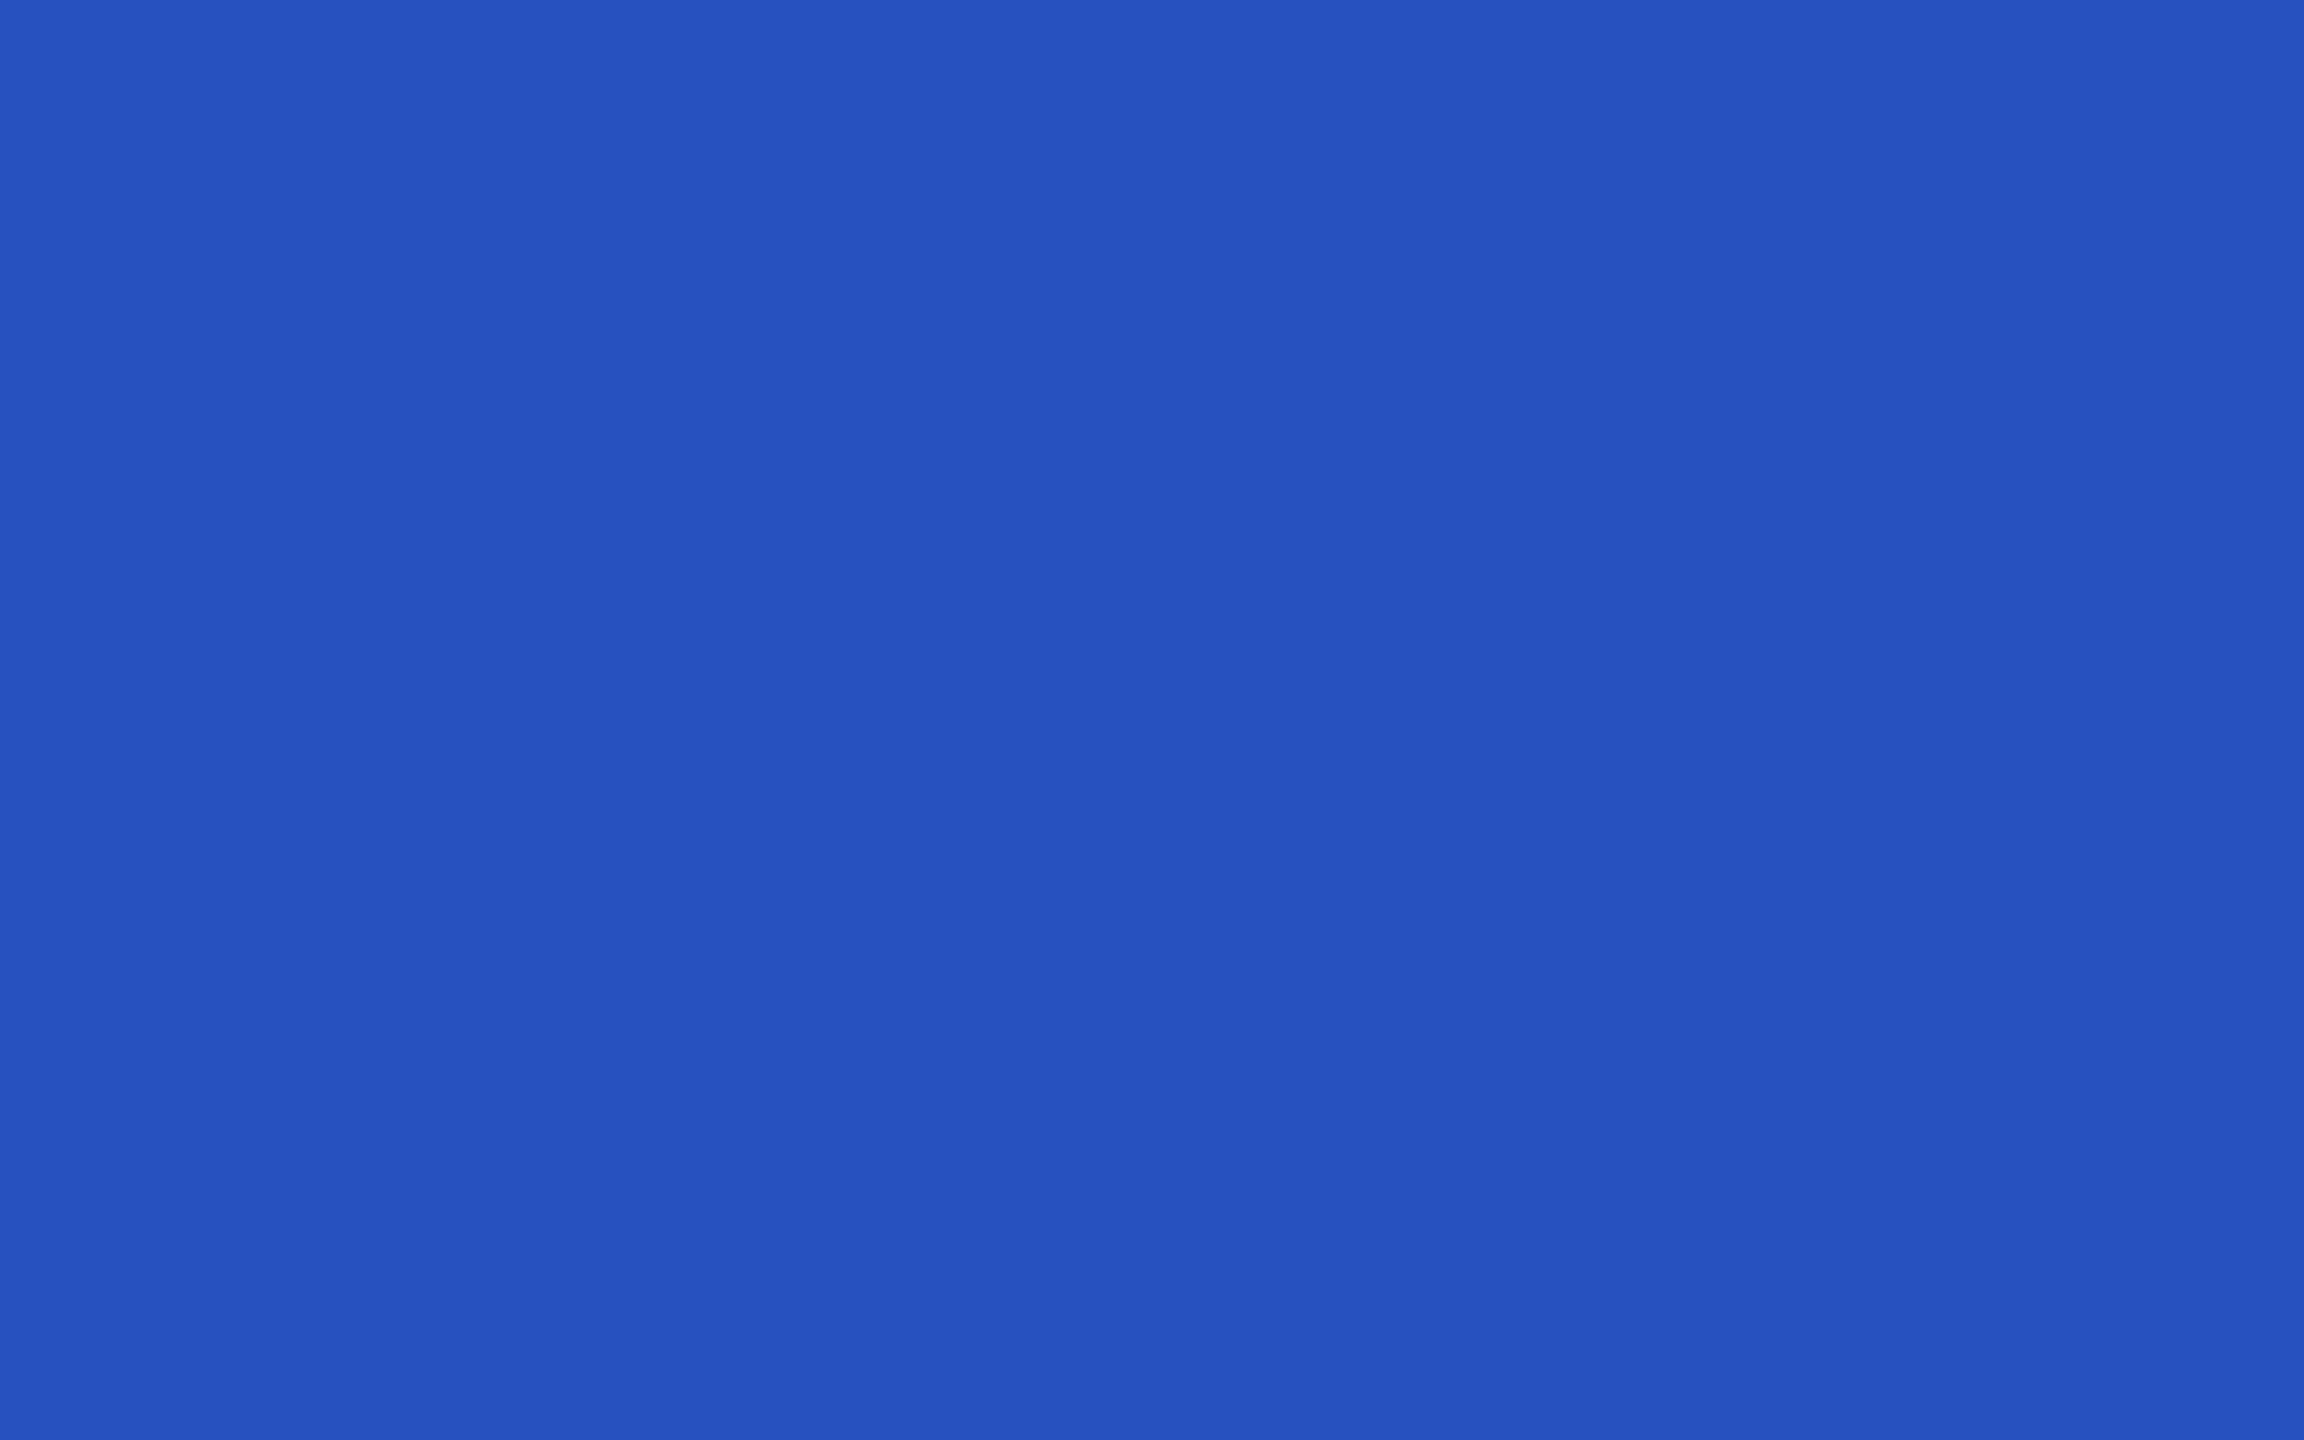 2304x1440 Cerulean Blue Solid Color Background